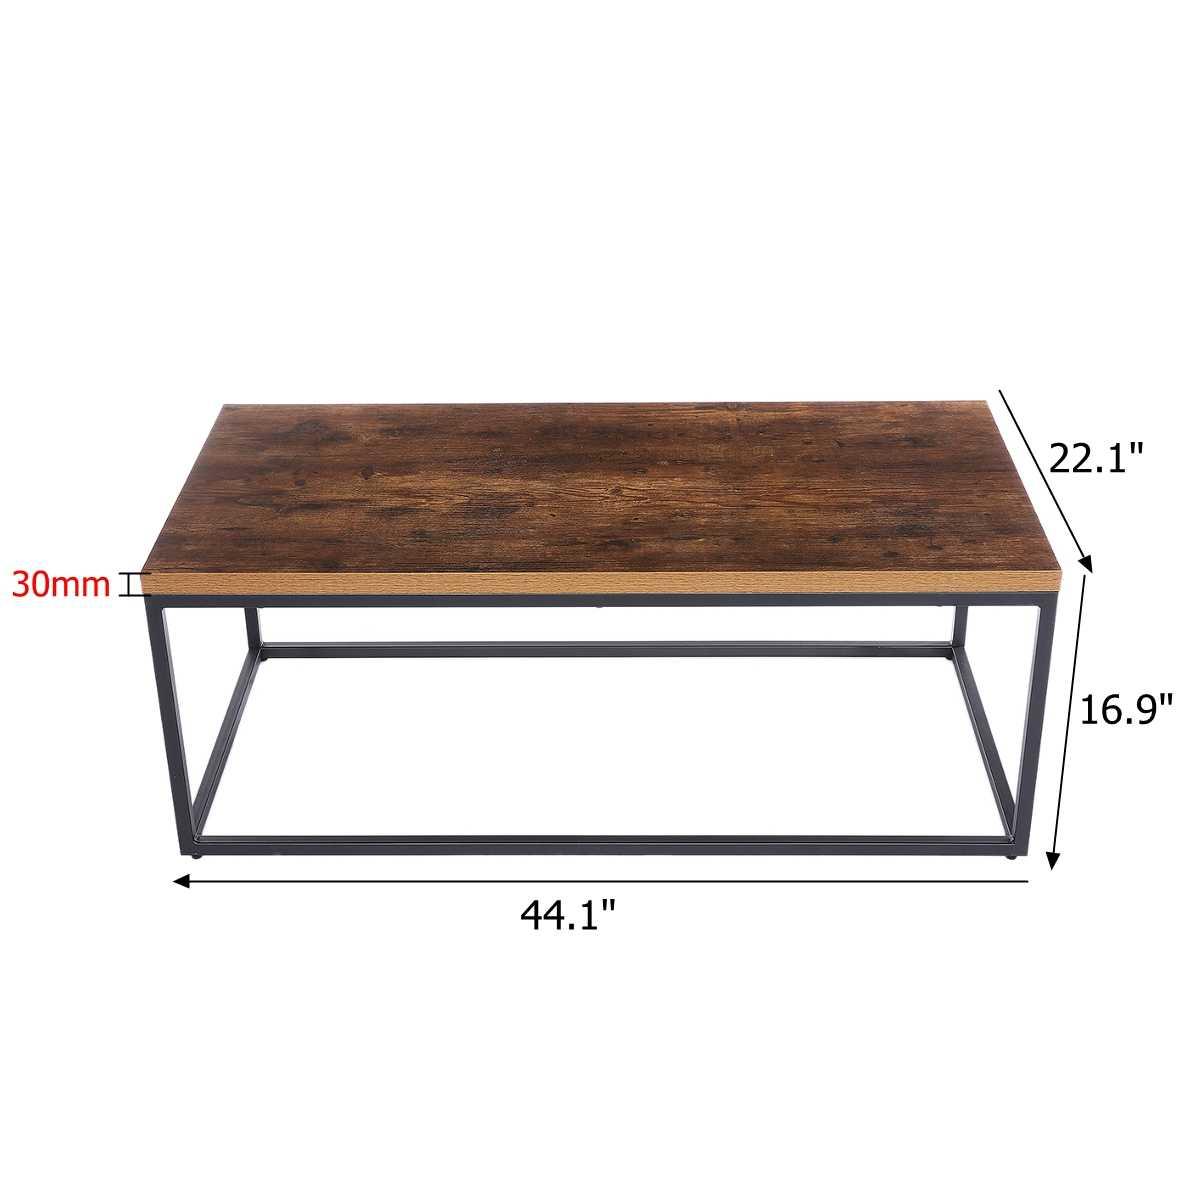 Modern Industrial Coffee Table Wood And Metal Frame Living Room